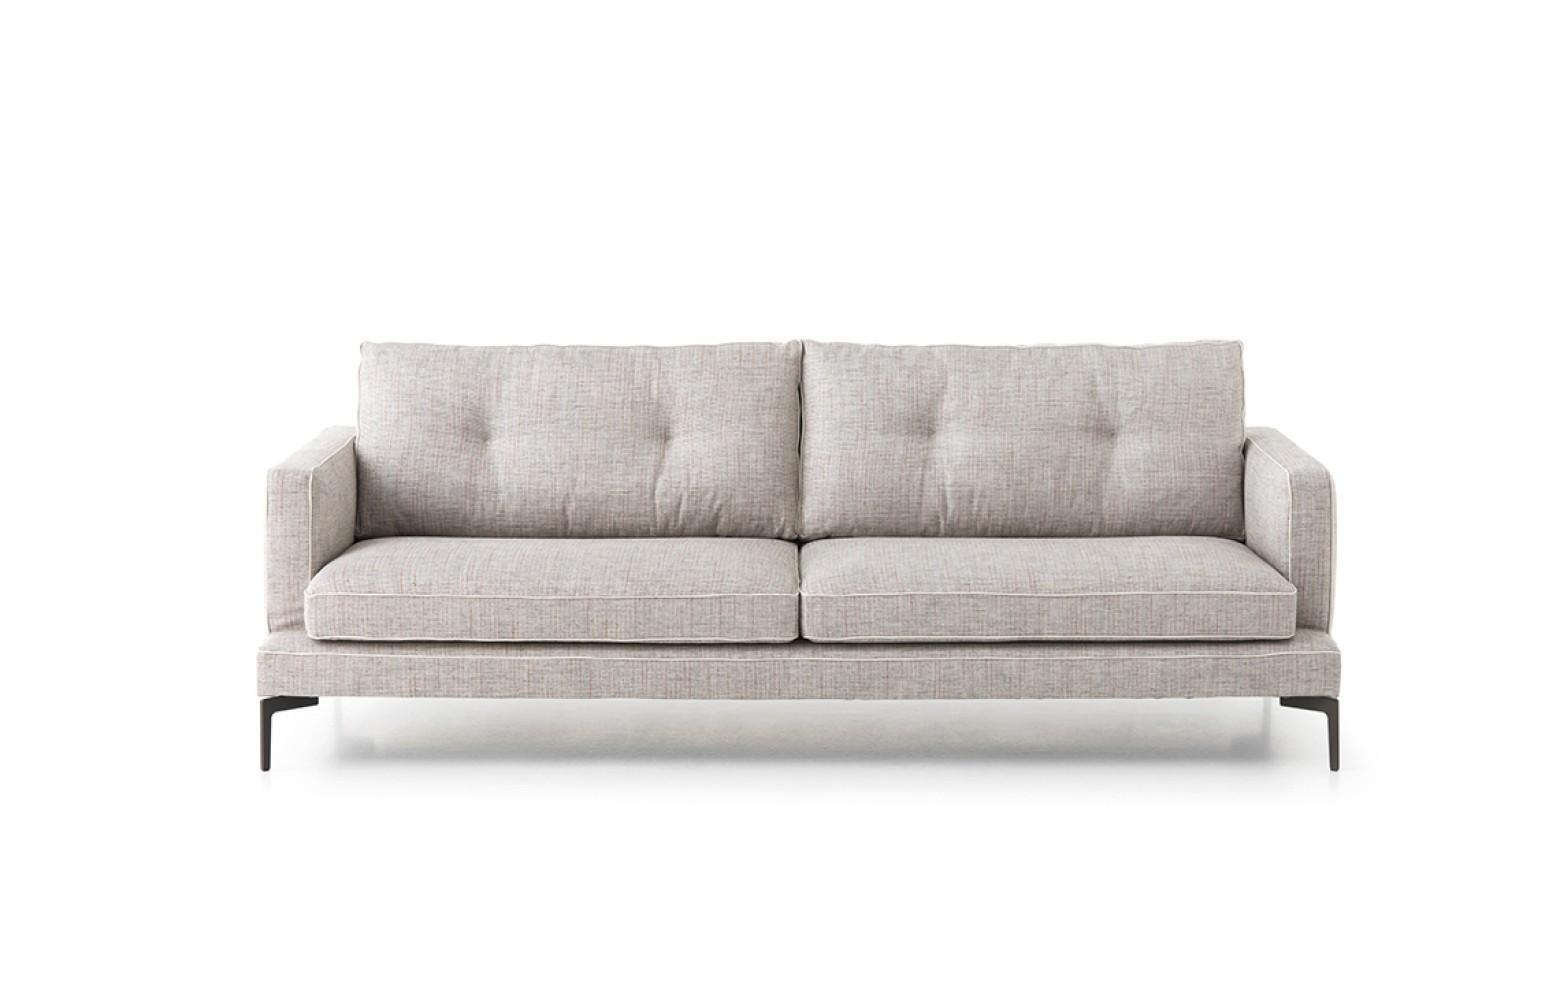 essentiel 2 sitzer einzelsofas polsterm bel who 39 s perfect. Black Bedroom Furniture Sets. Home Design Ideas